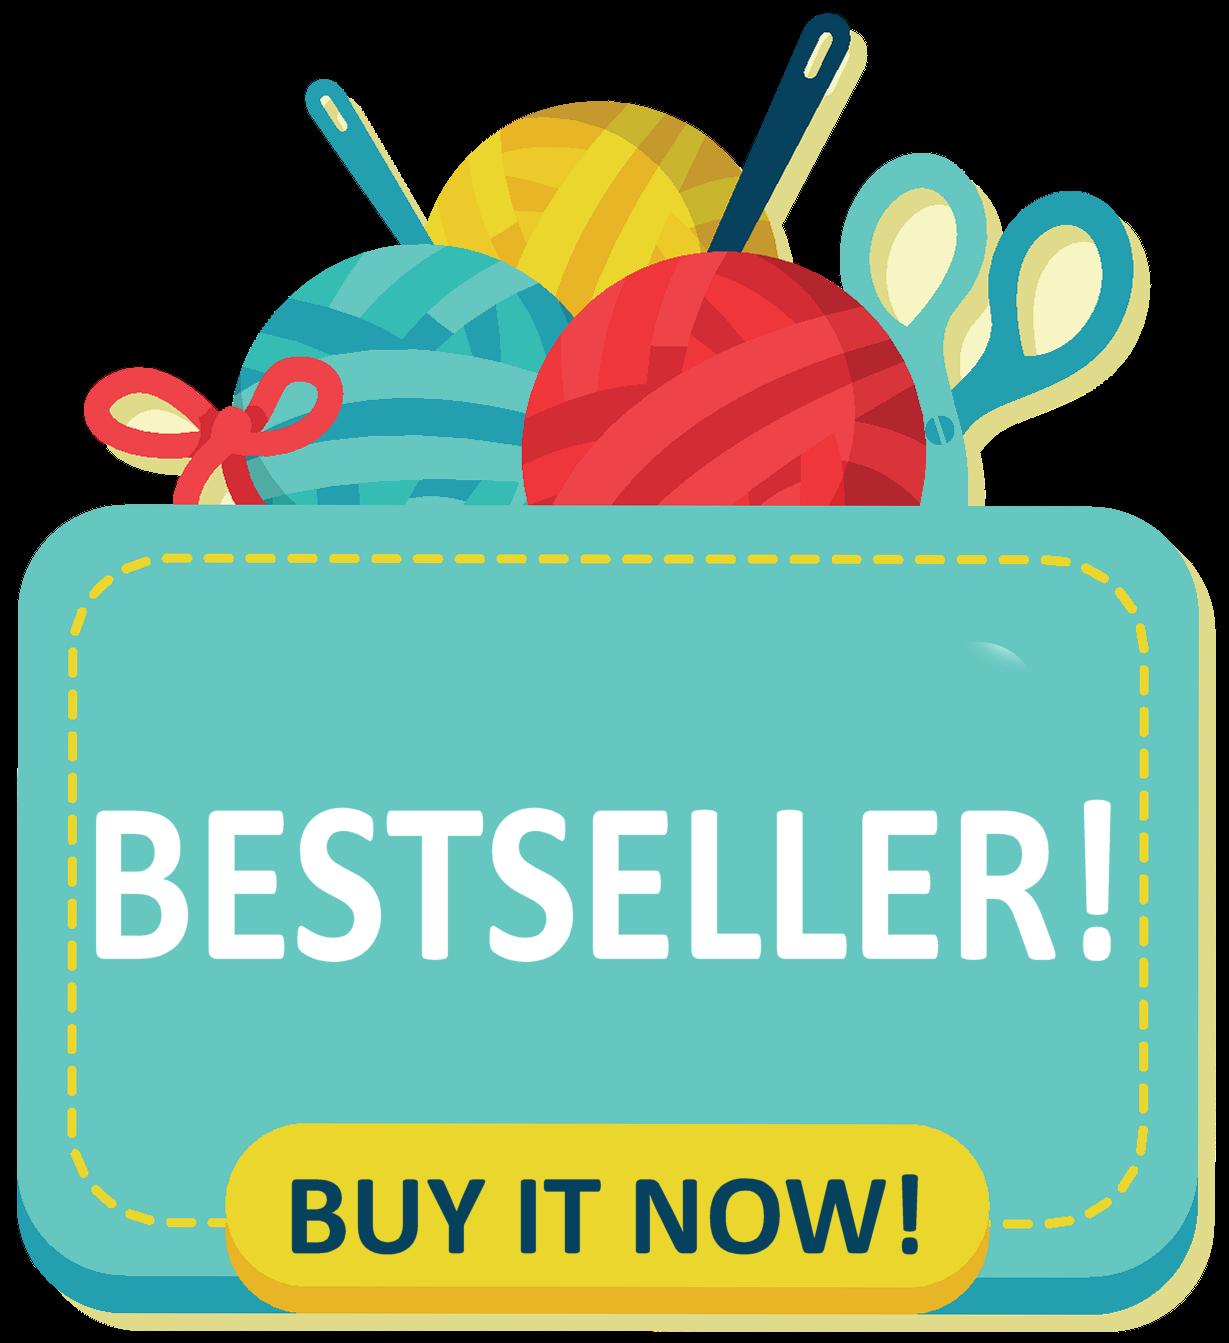 bestseller-button.png